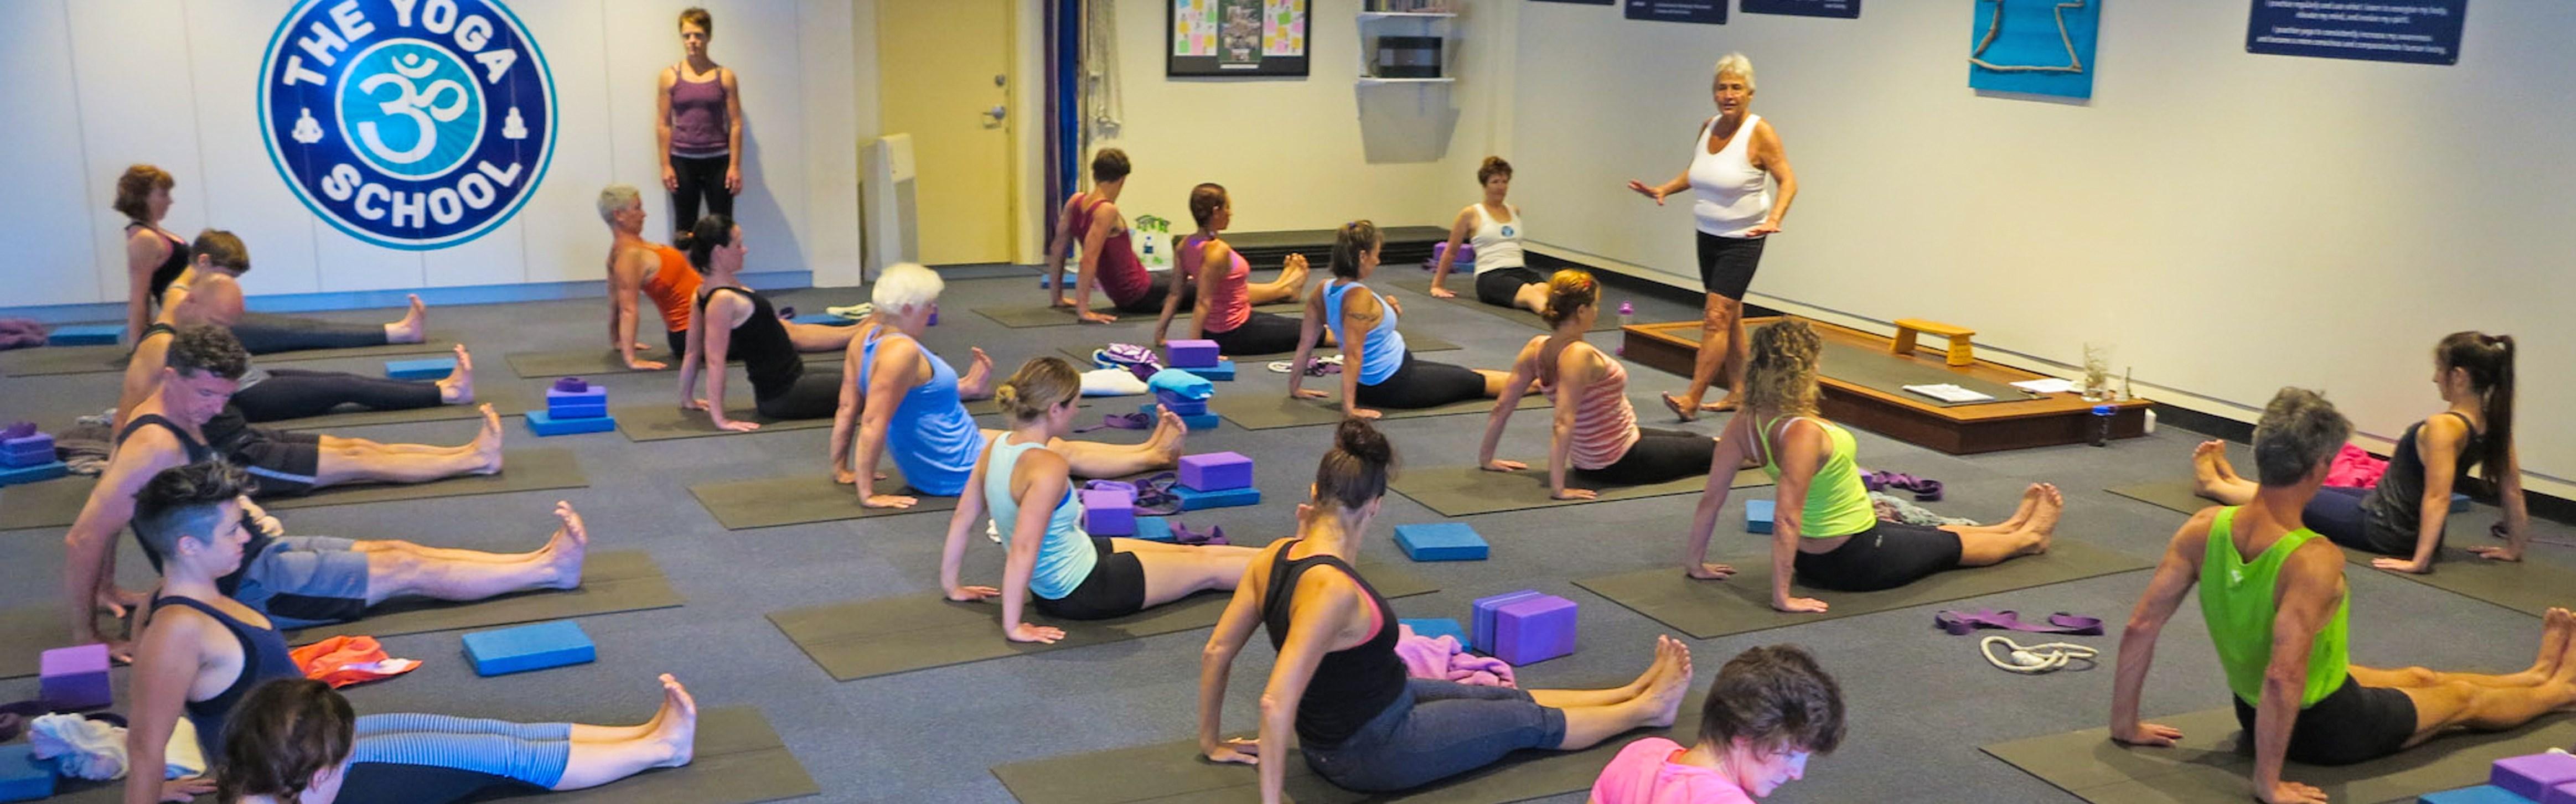 knoff-yoga-level-3-teacher-training-class